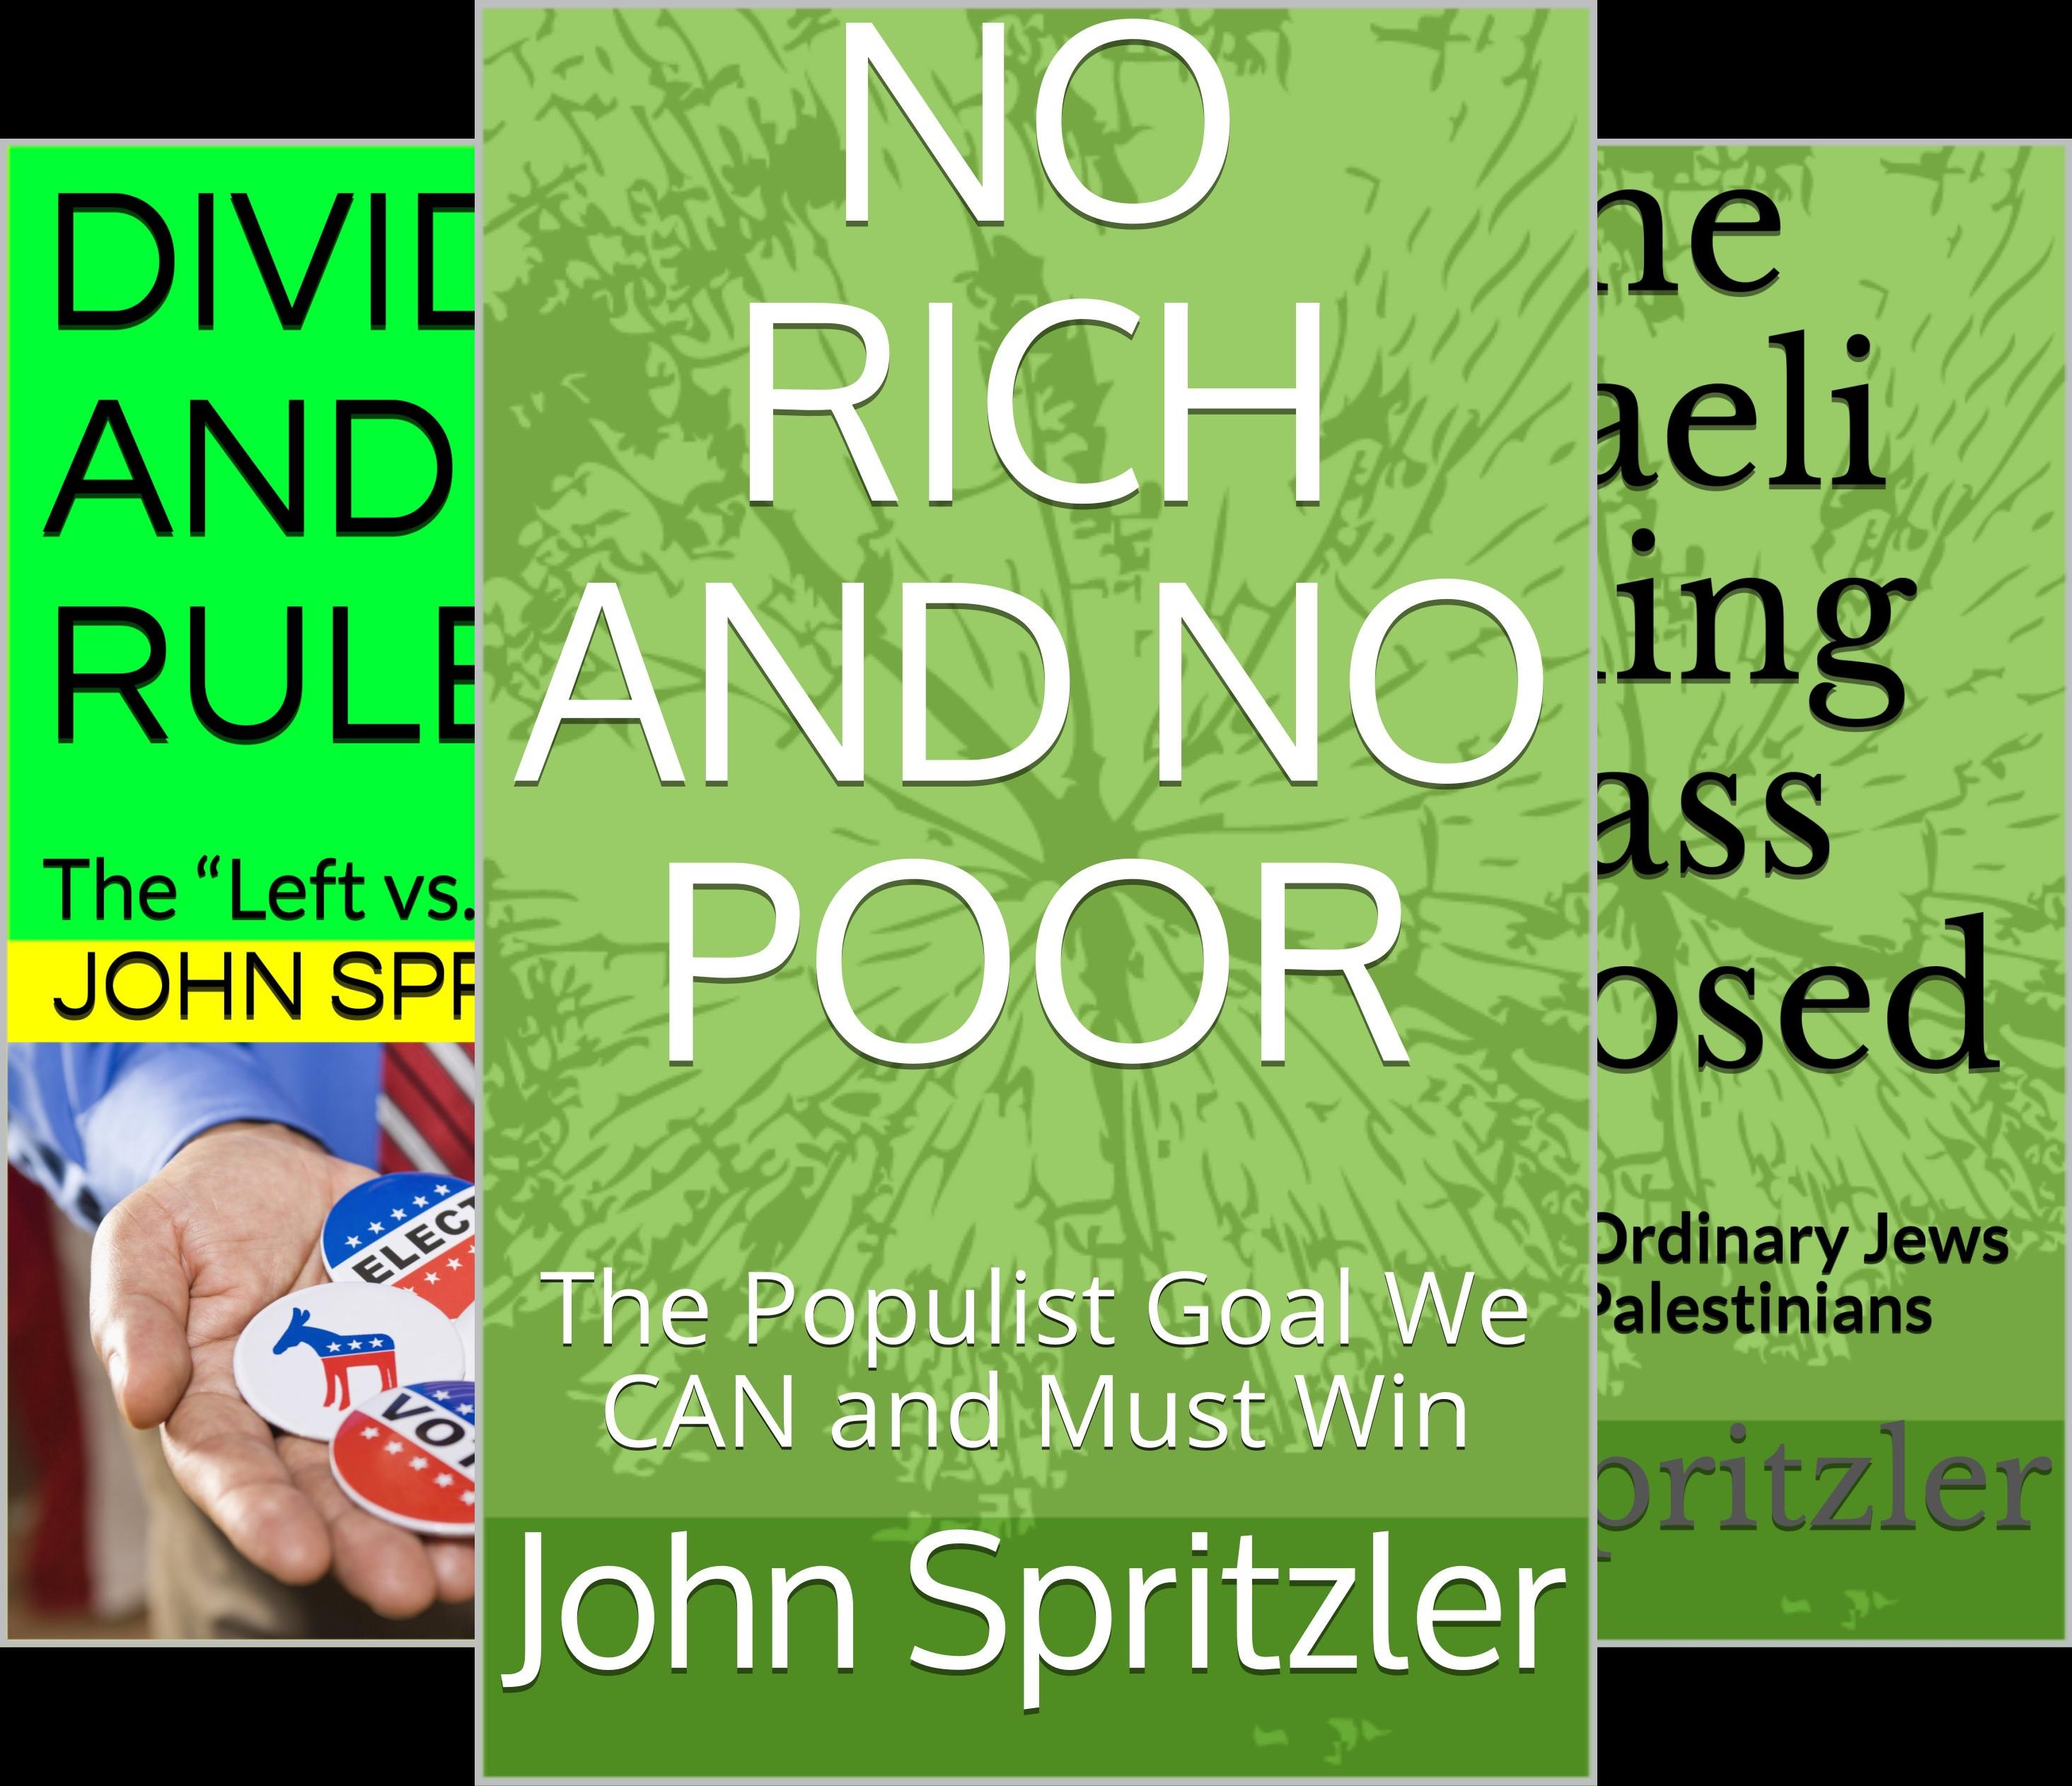 NO RICH AND NO POOR (3 Book Series)